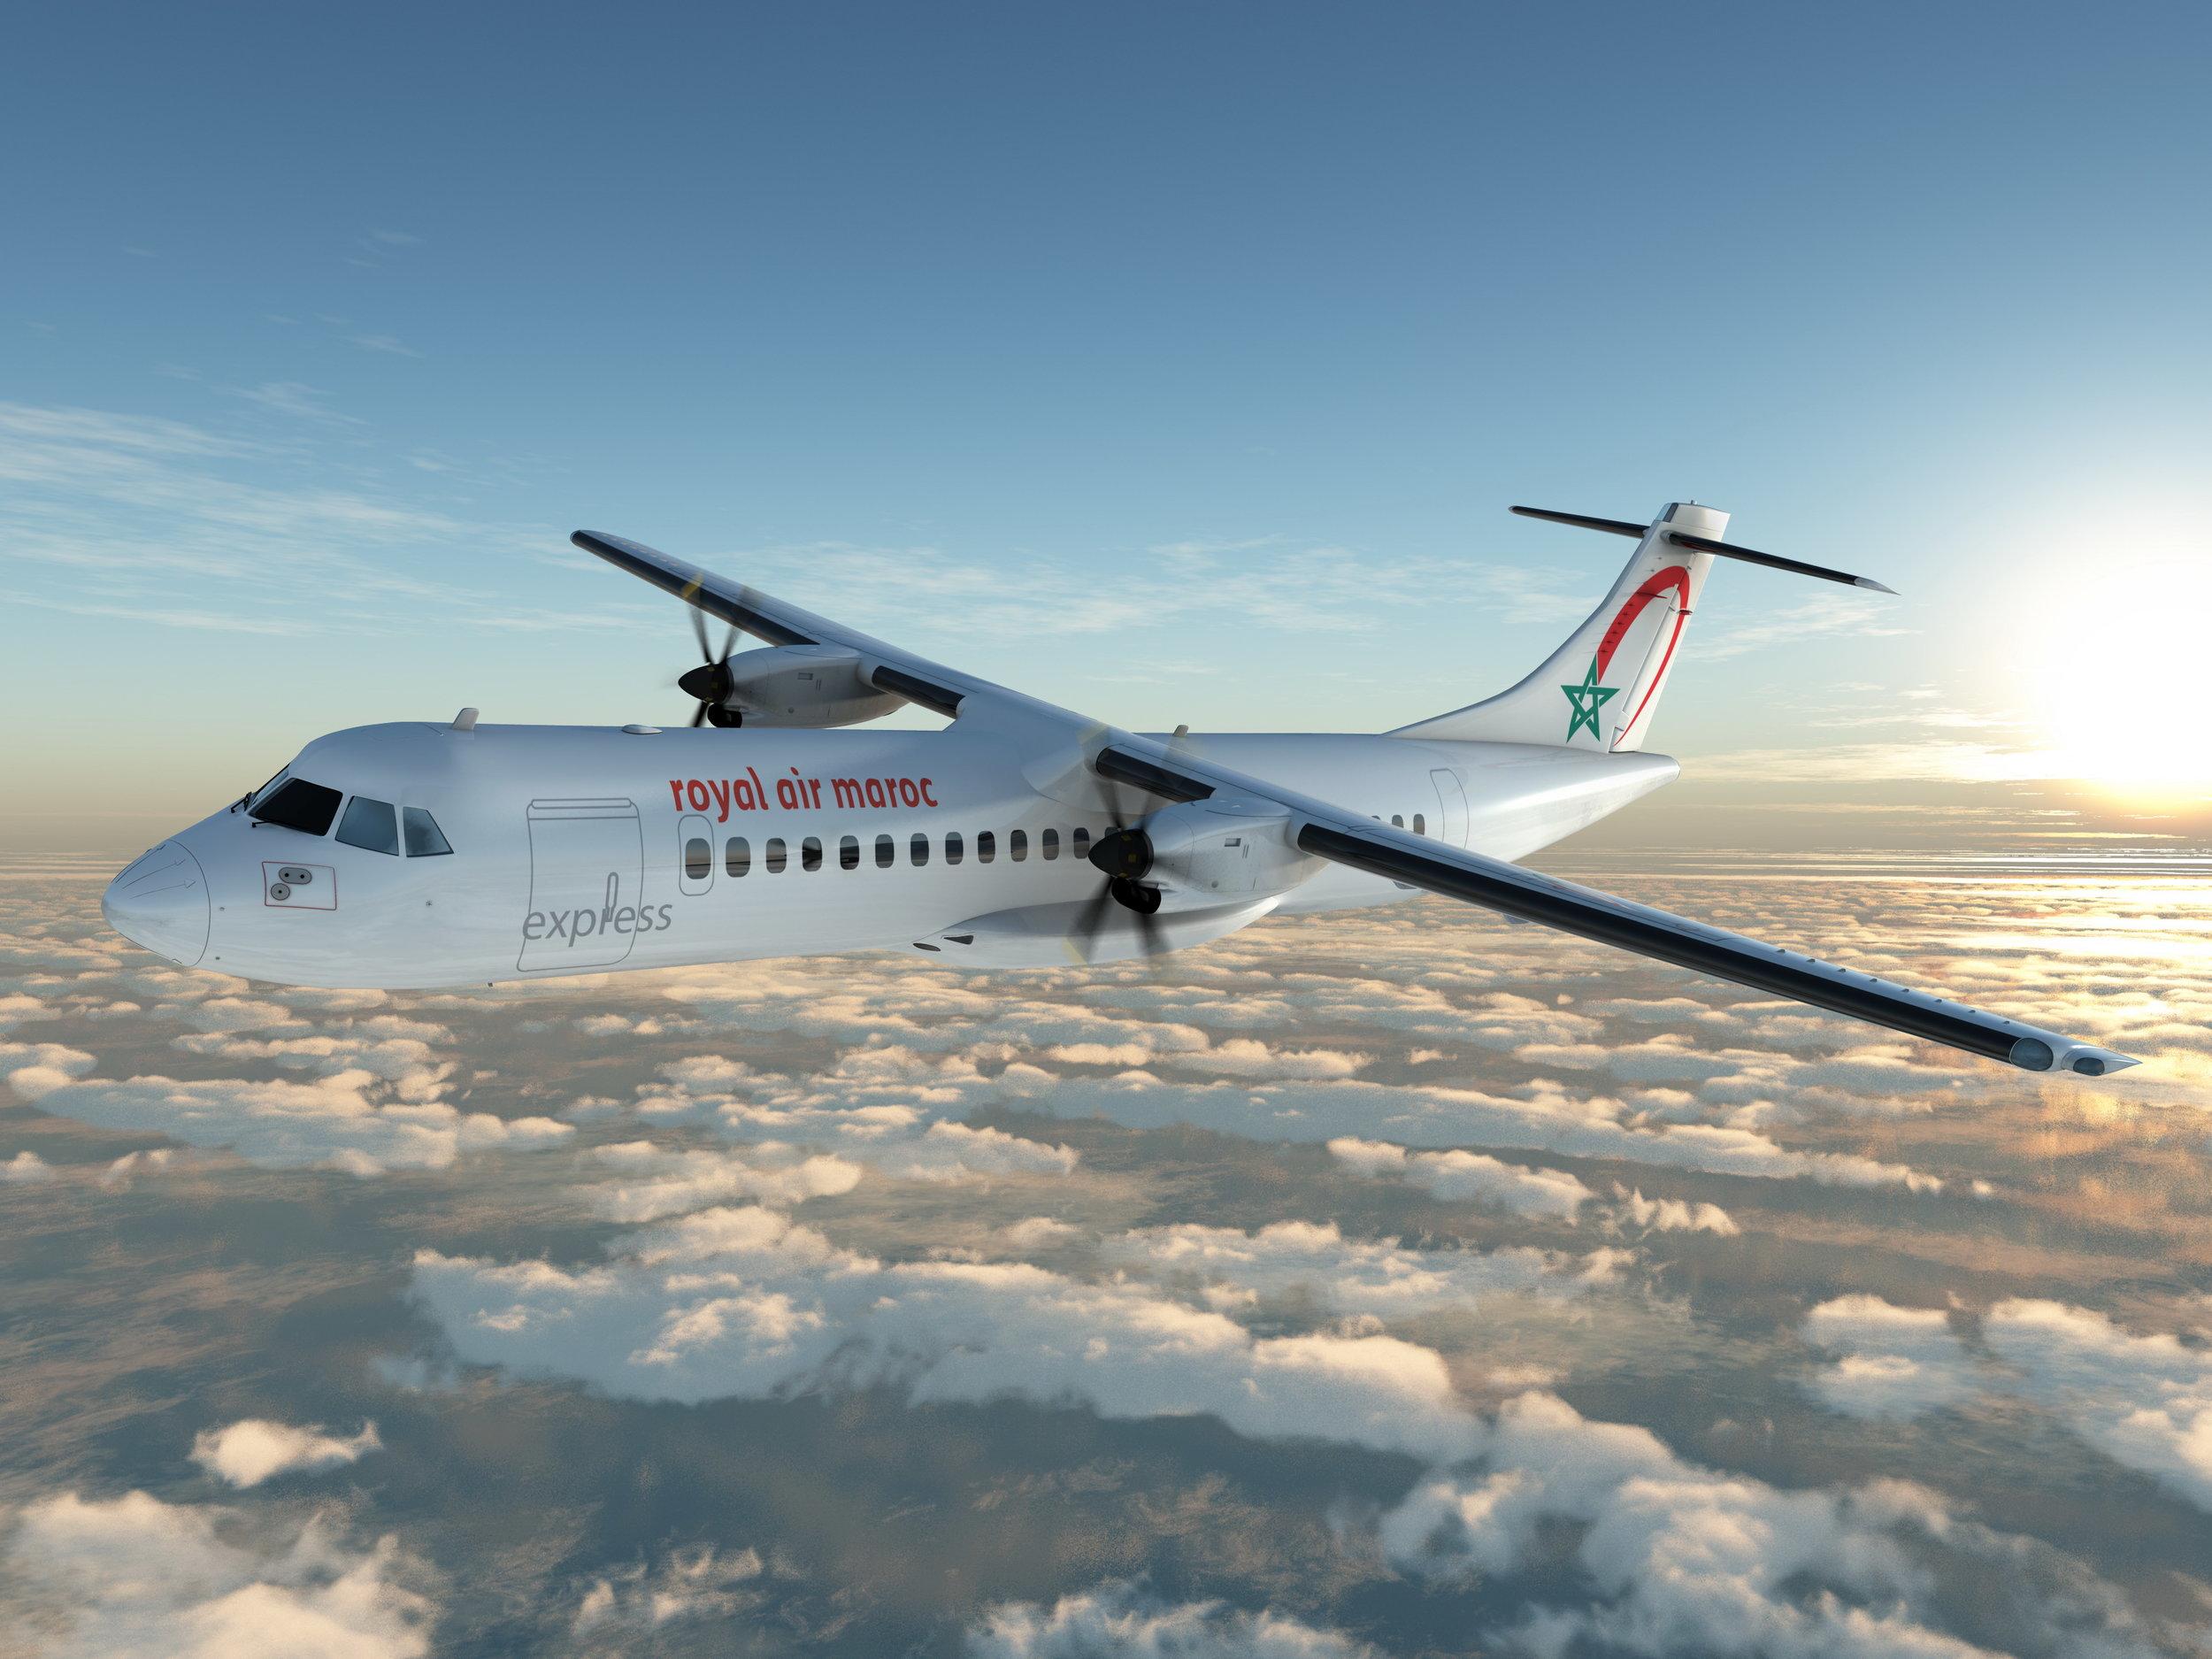 Royal Air Maroc flights to Tangier